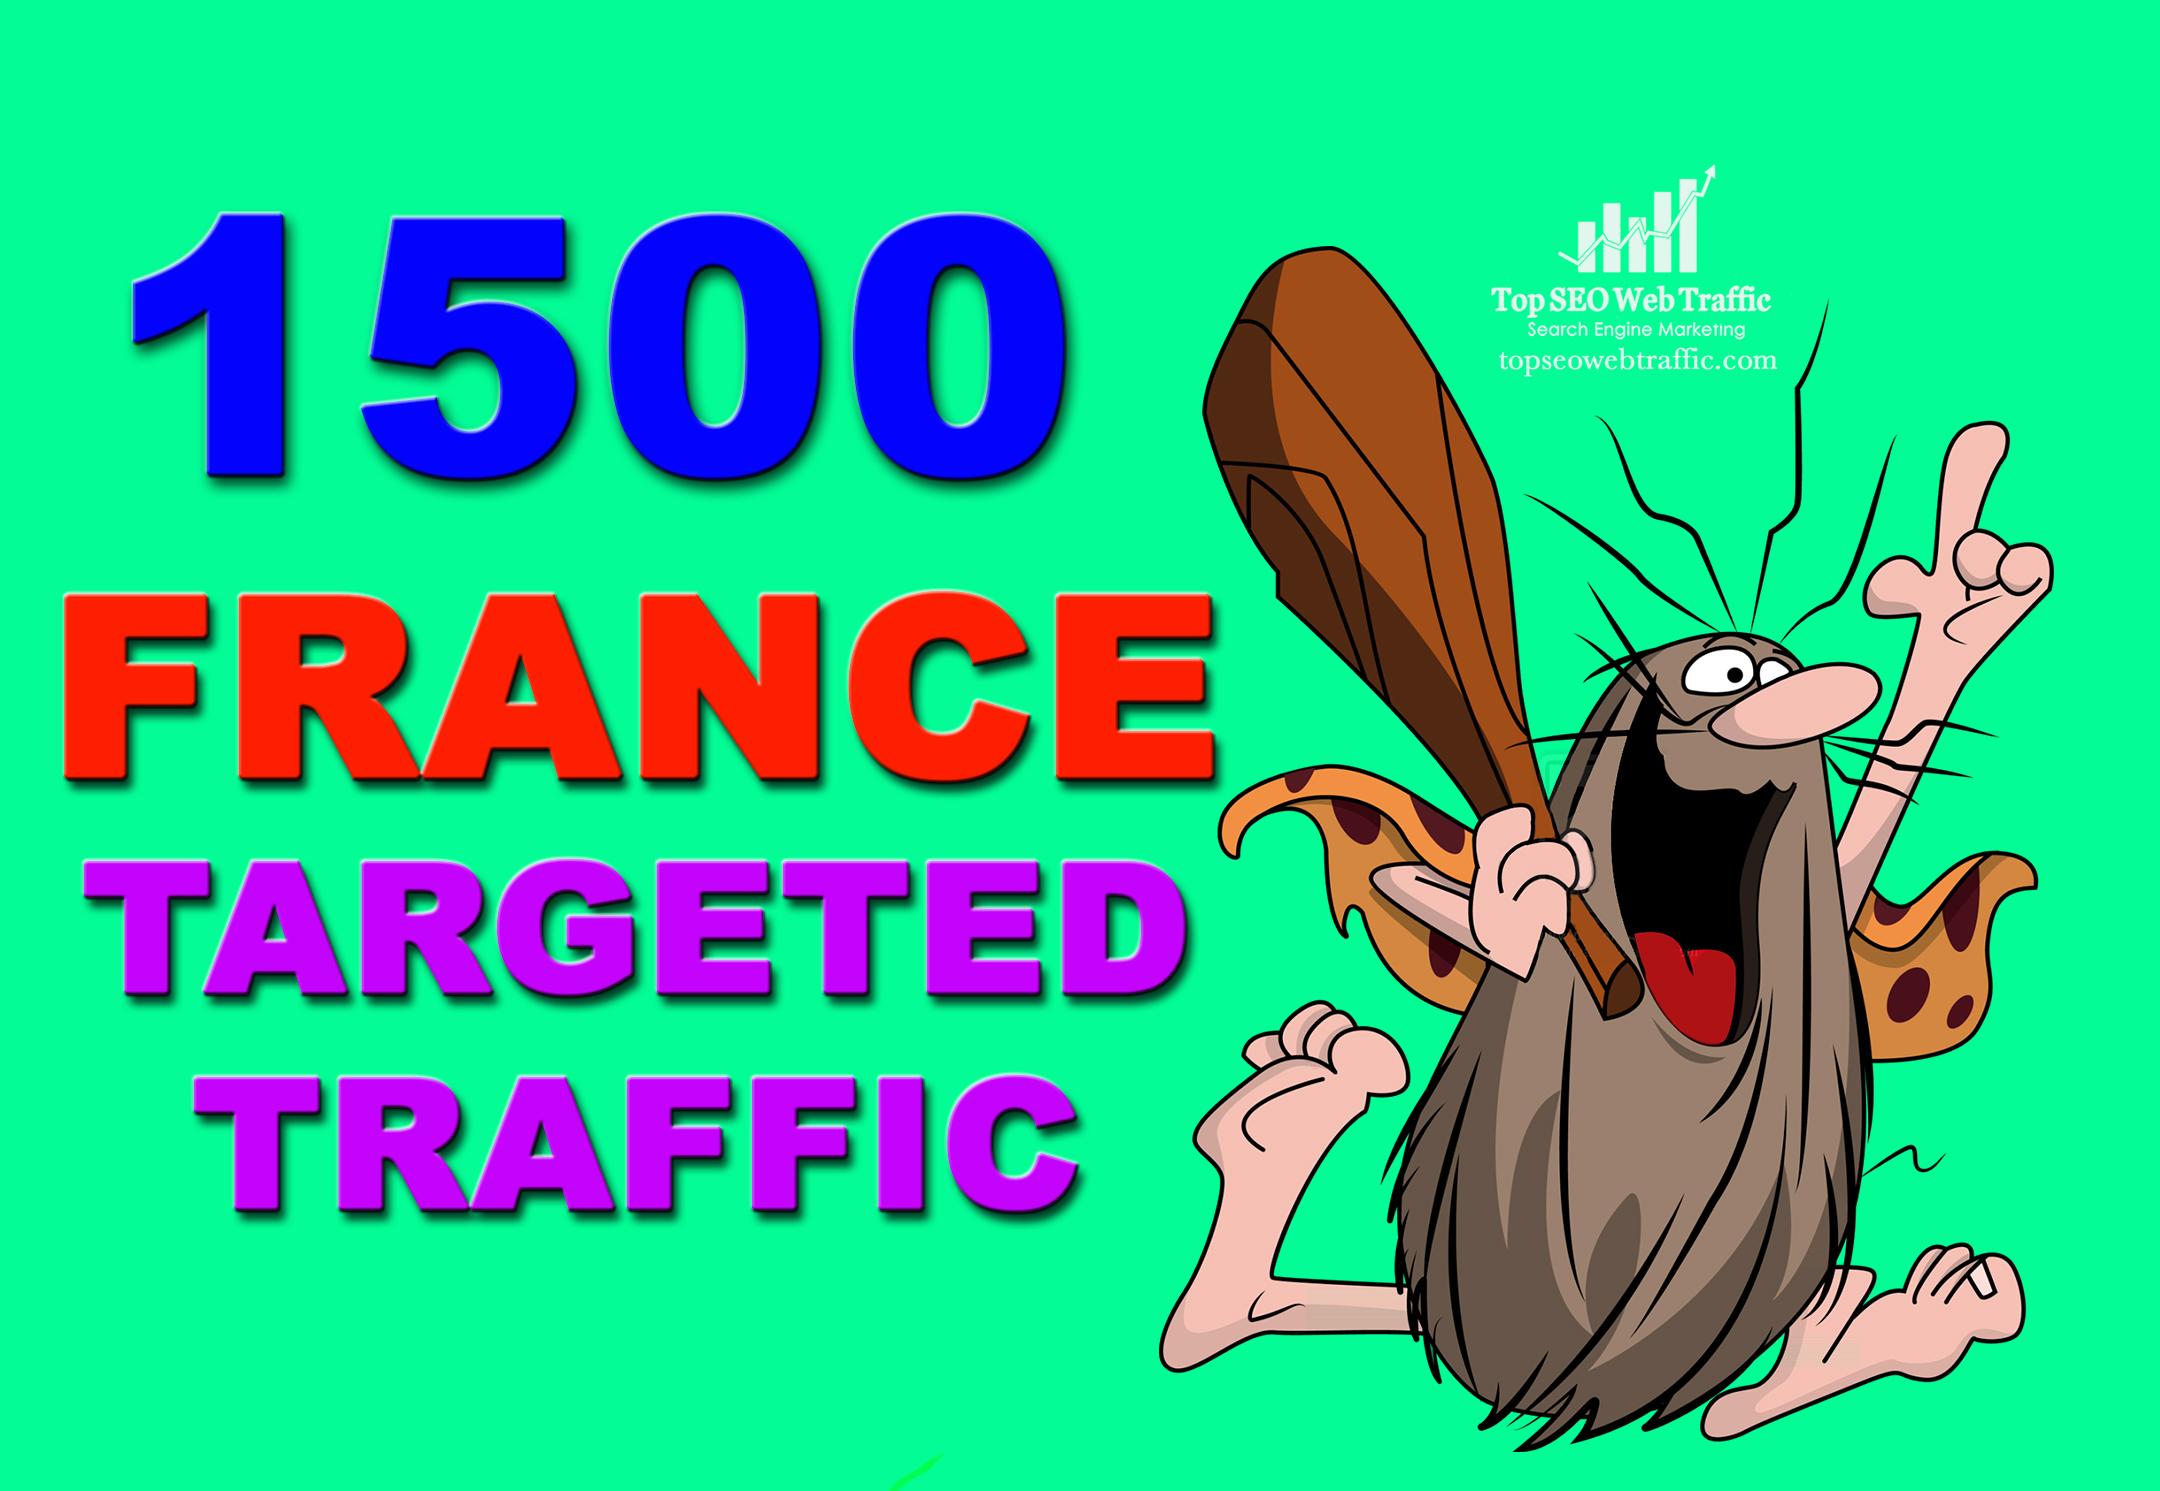 GET 1500 HIGH QUALITY UNIQUE FRANCE WEB TRAFFIC VISITORS